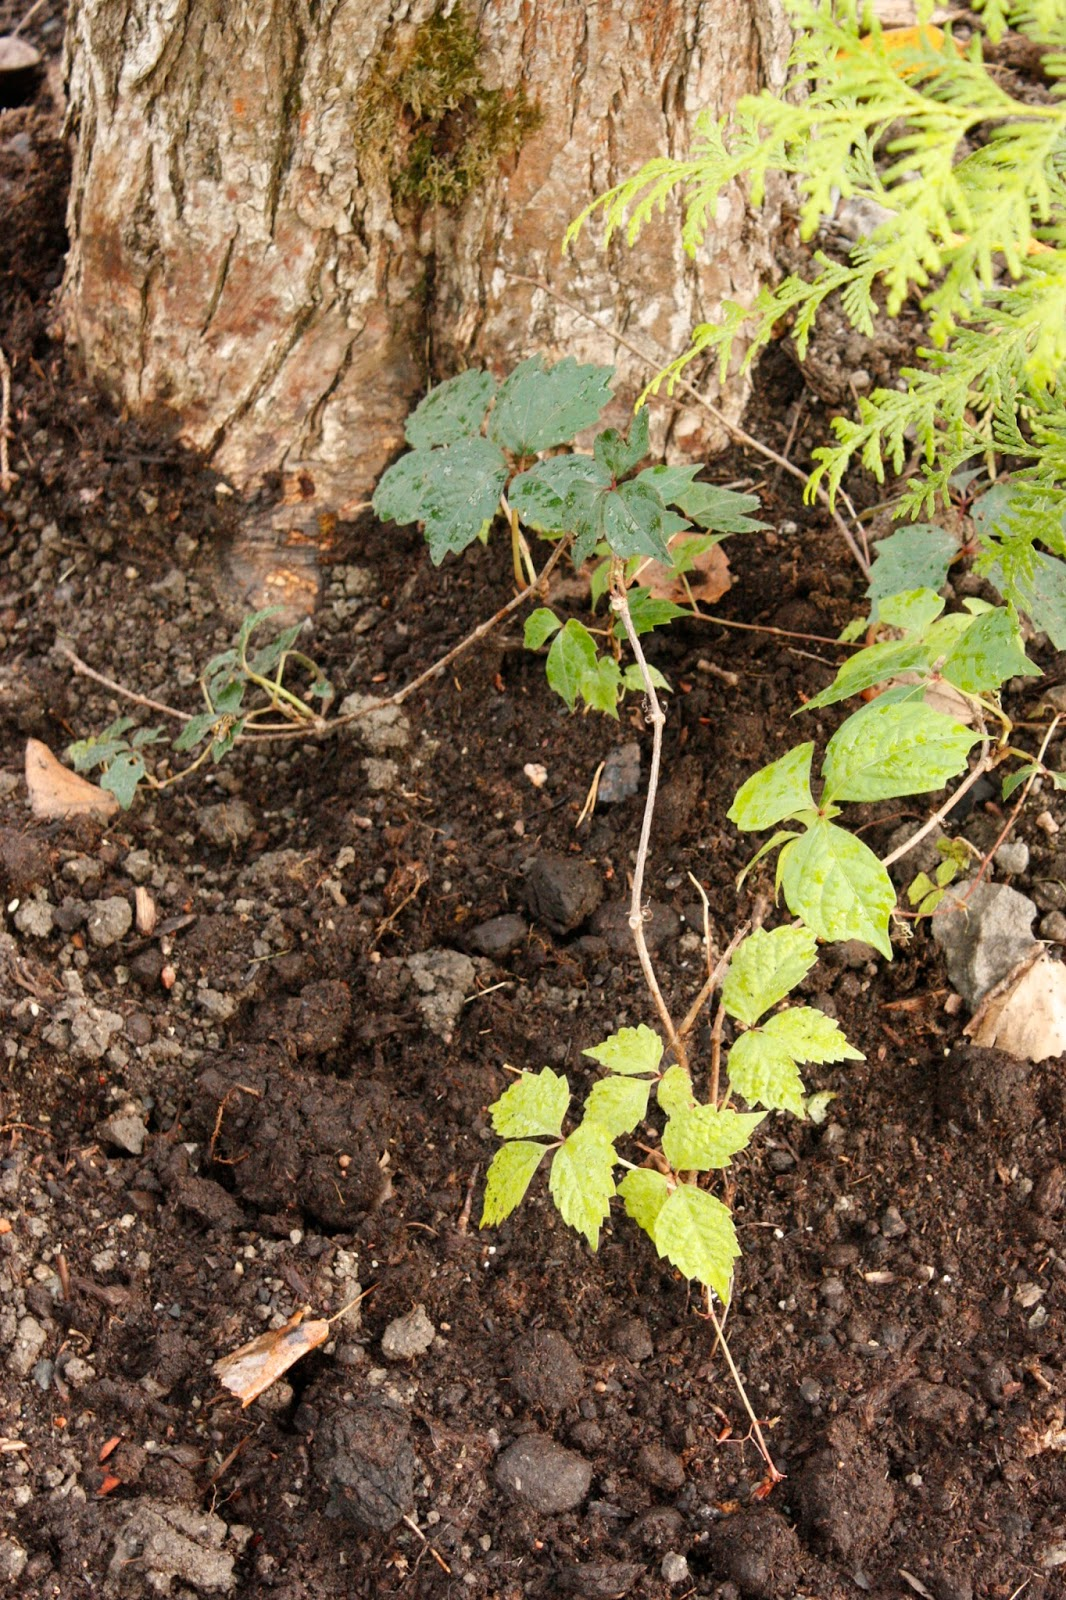 Josefins trädgård: Gräv, gräv, gräv - bara gräv, gräv, gräv